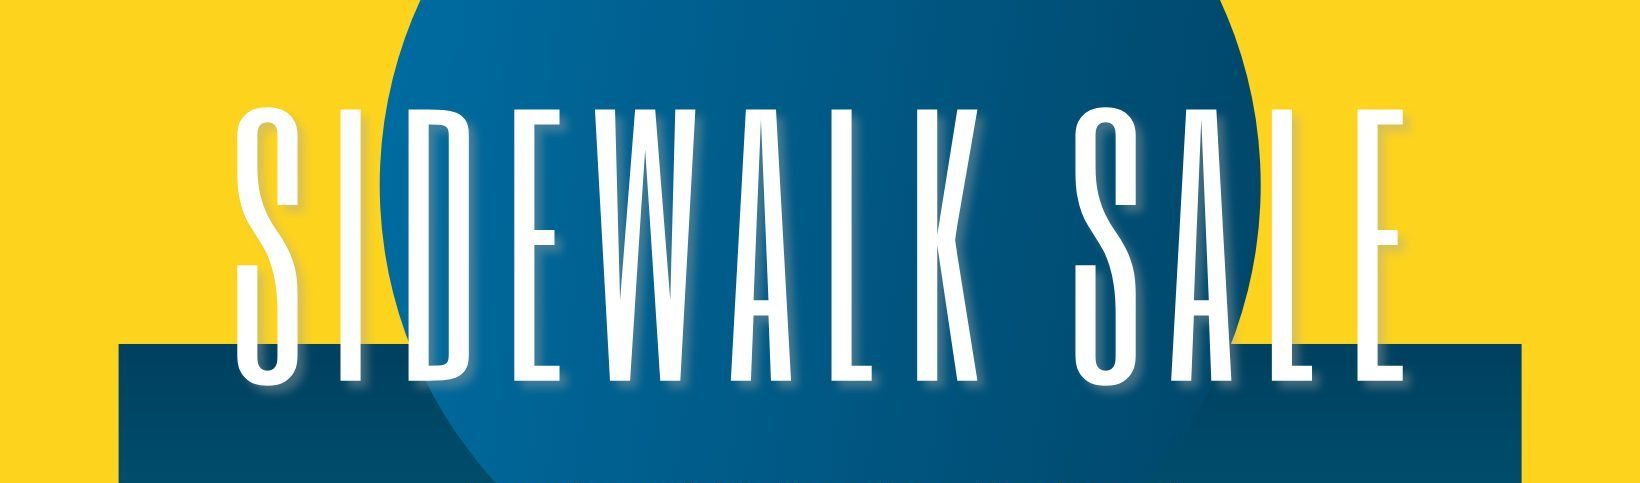 Copy of Copy of Copy of Sidewalk Sale2